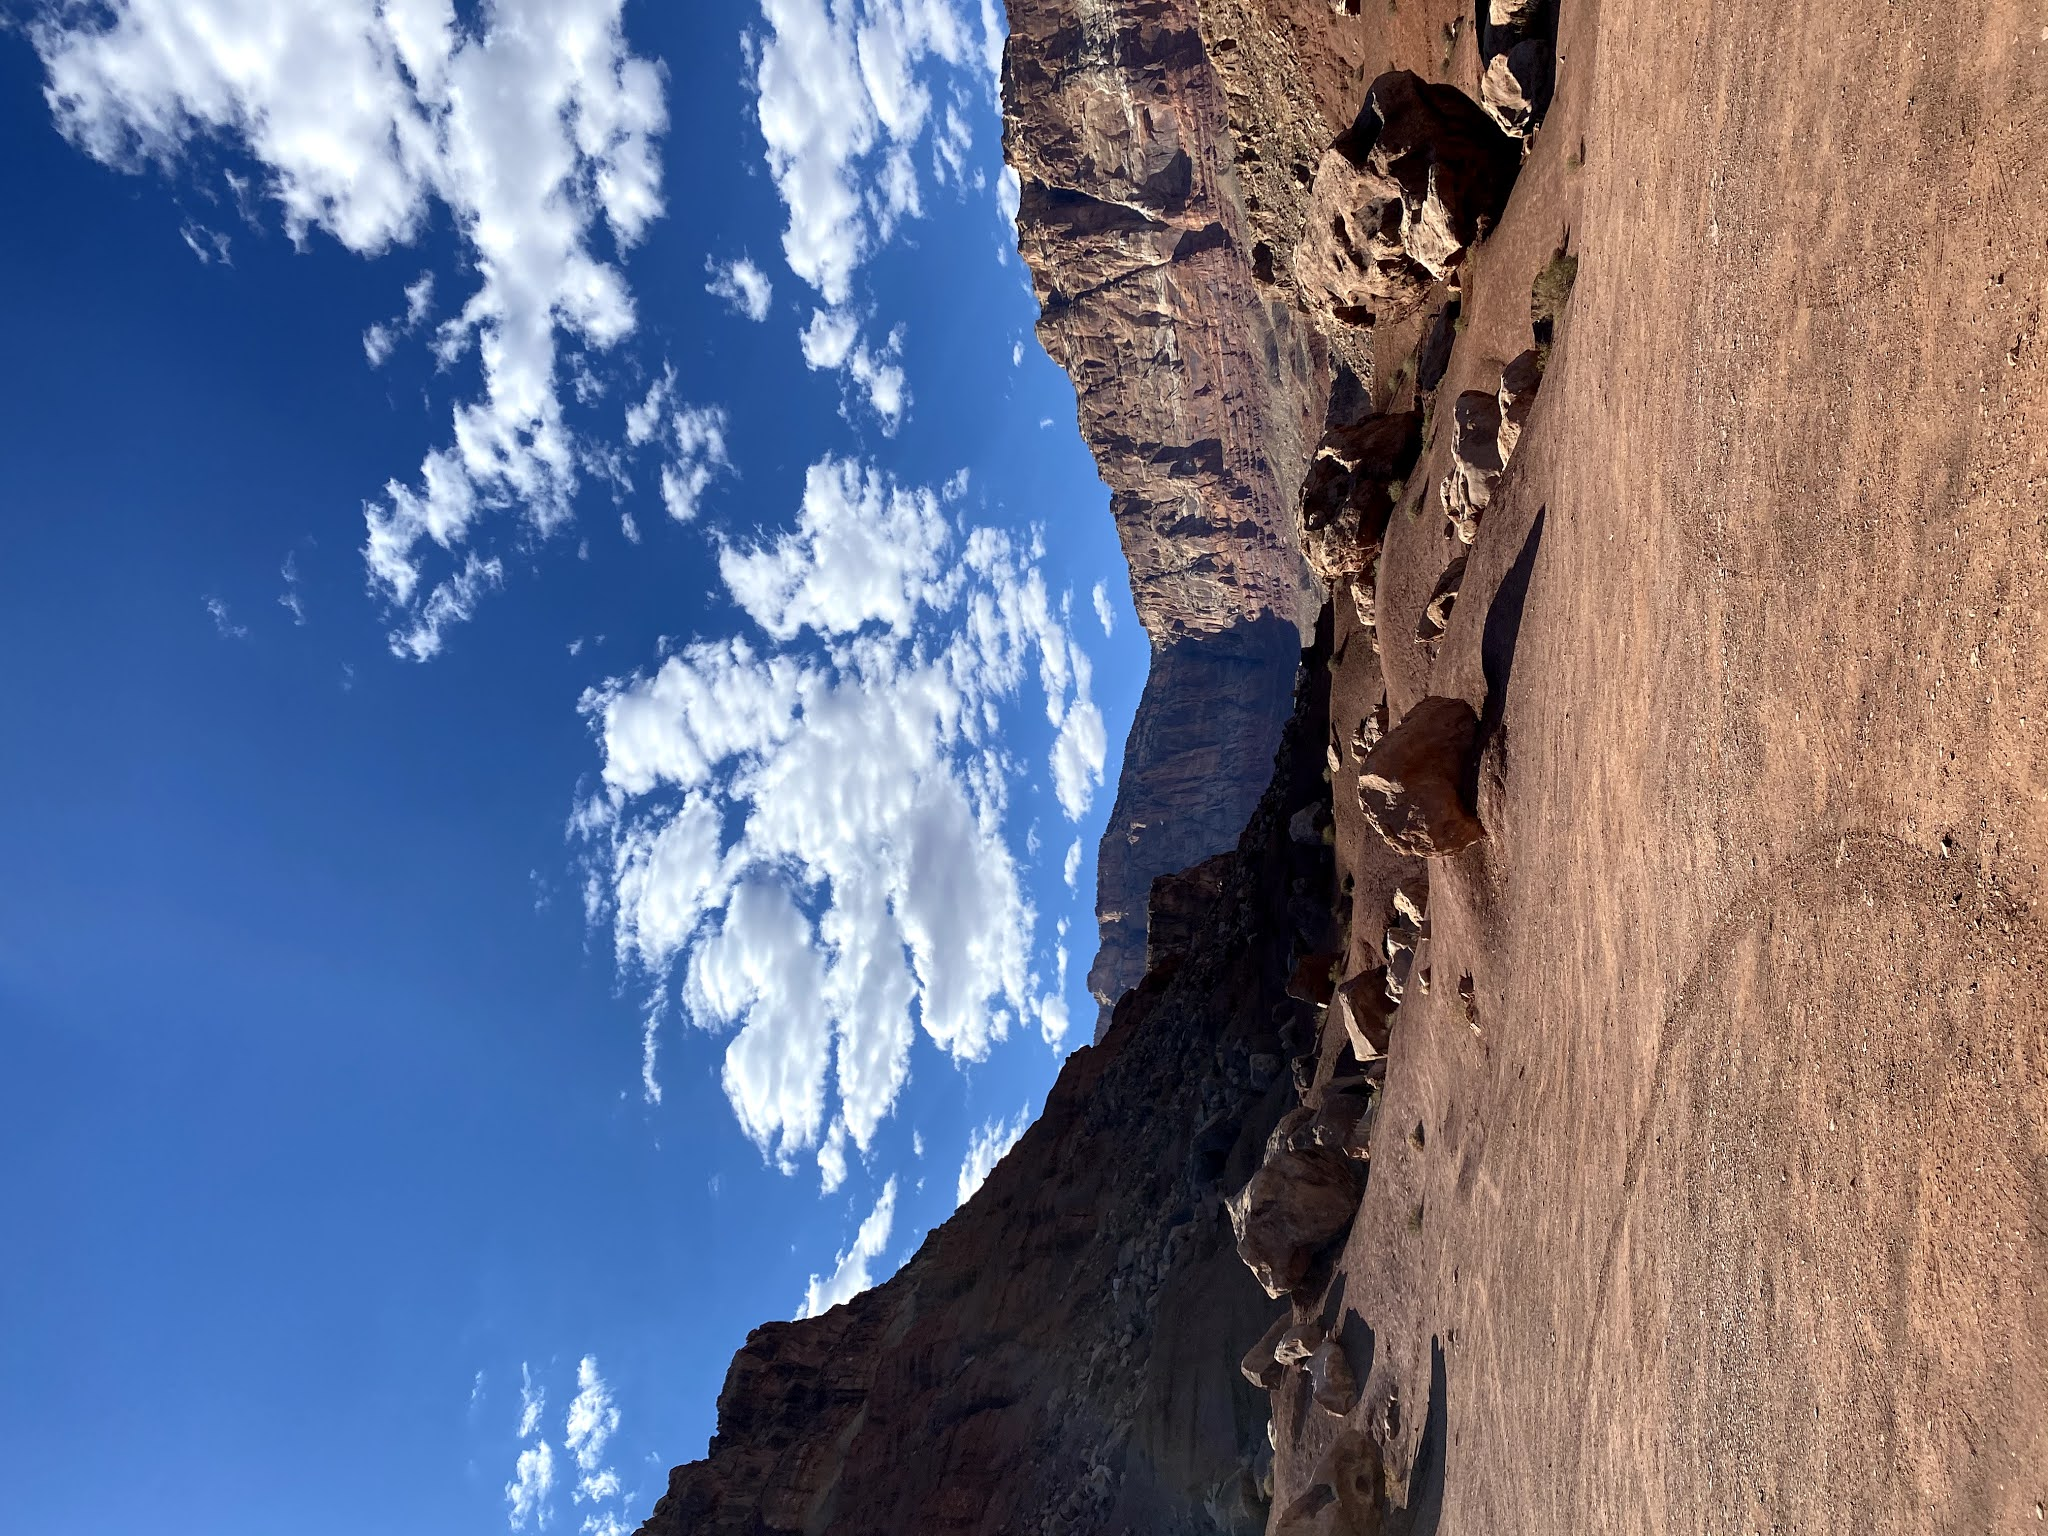 Desert Rocks | biblio-style.com